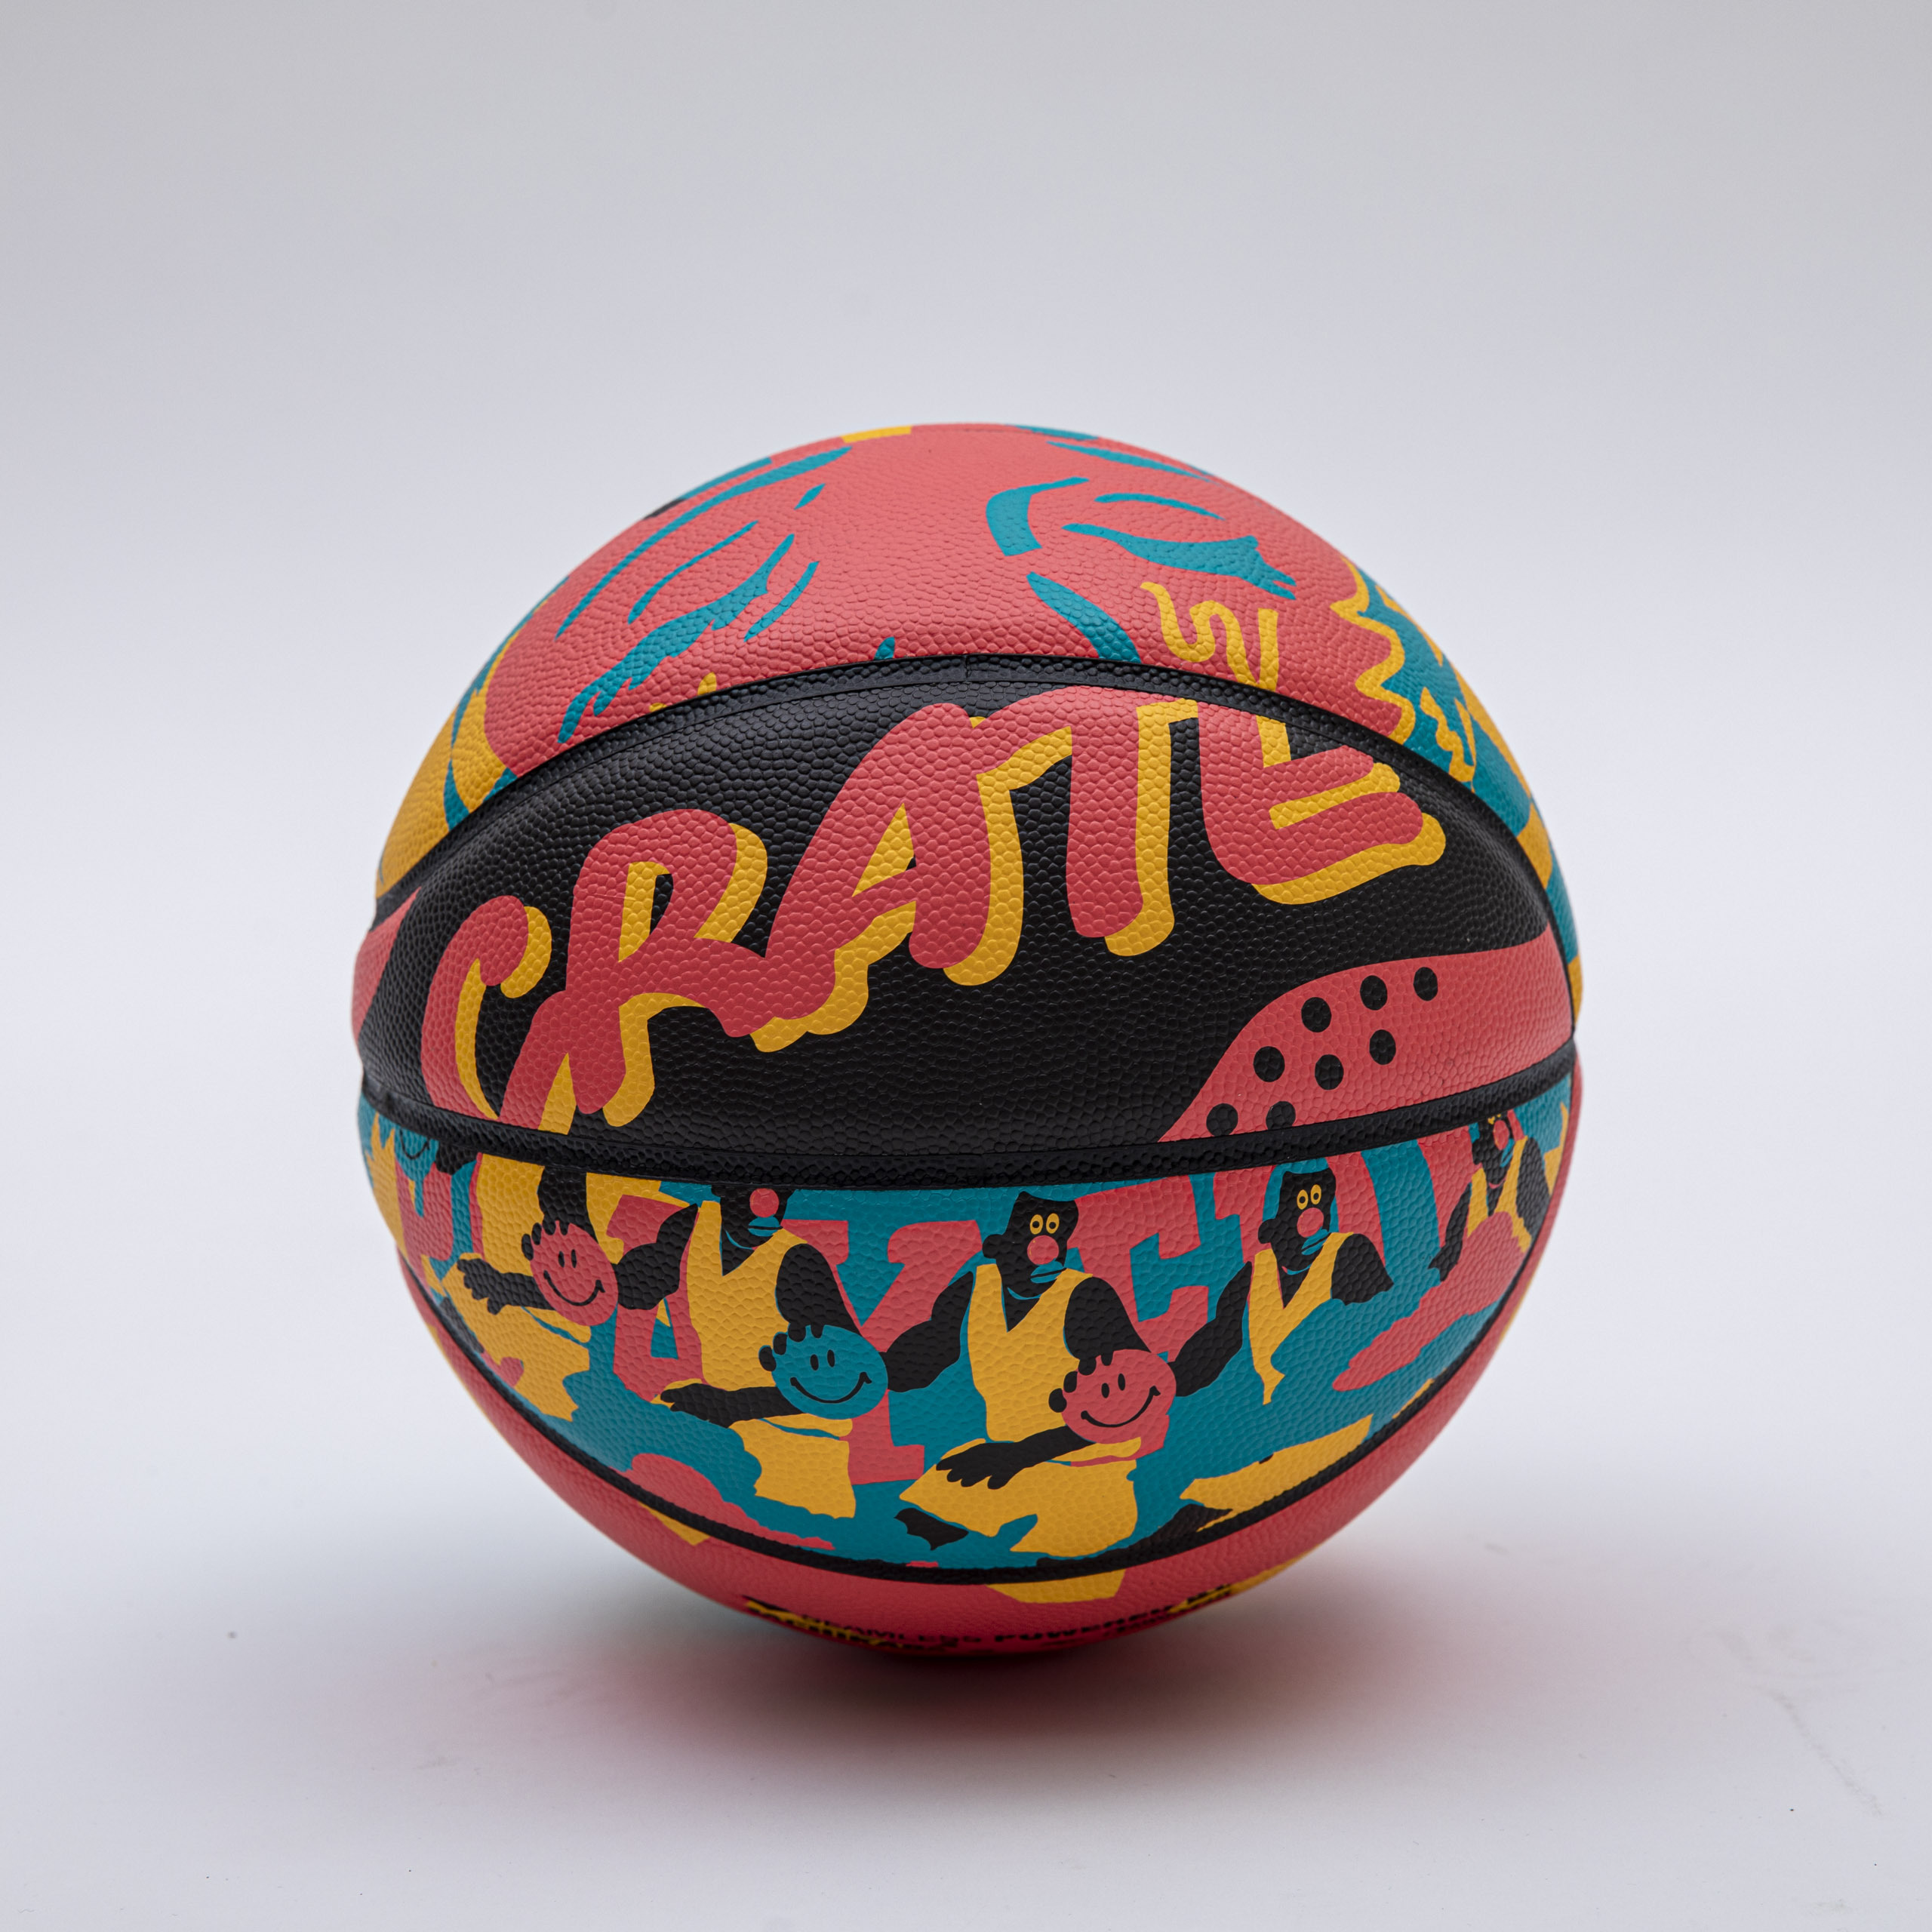 CRATE ORIGINALS #1 Toyameg Collaboration